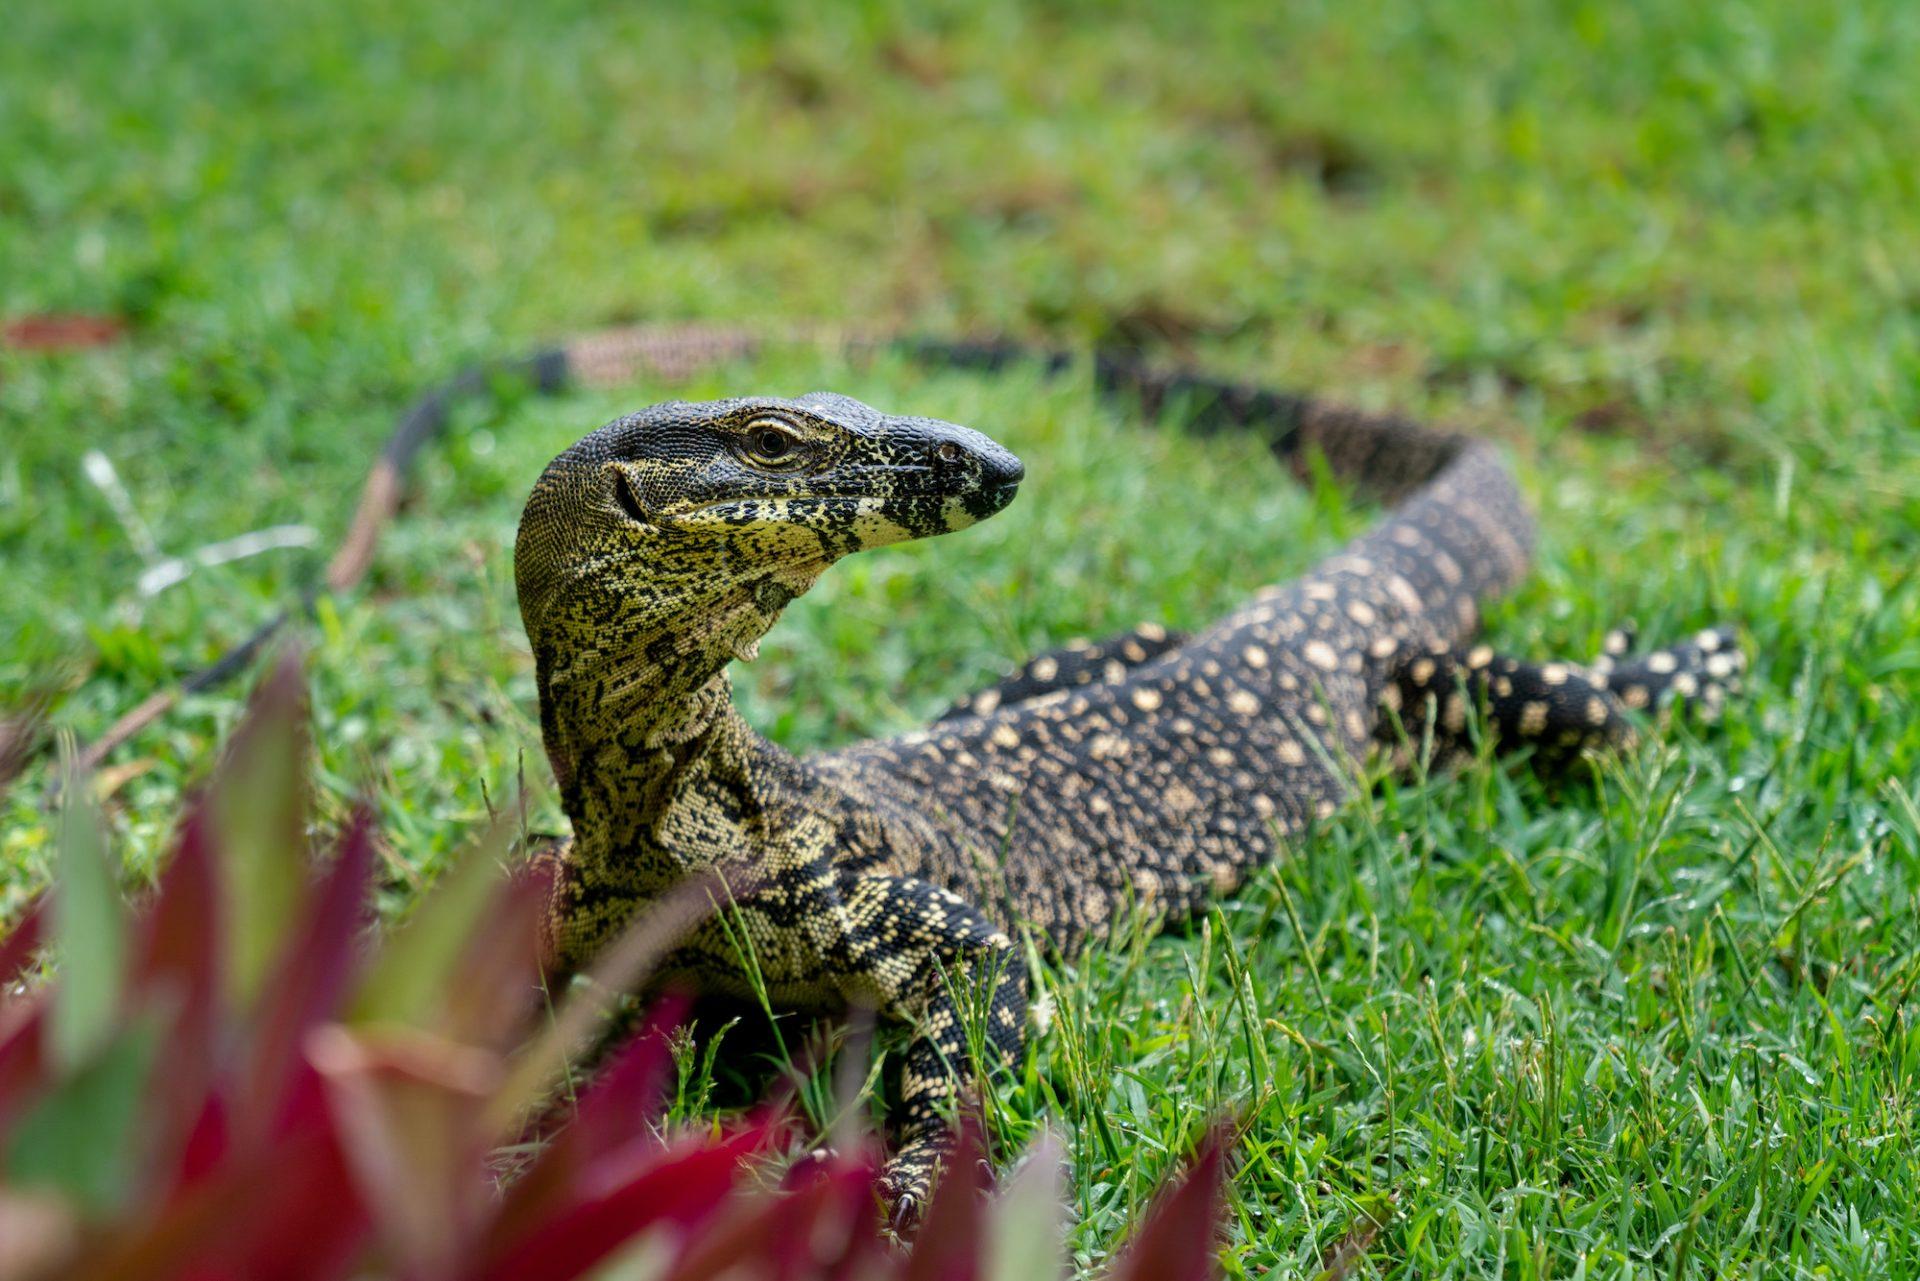 Lace Monitor – Noosa Heads, Australia